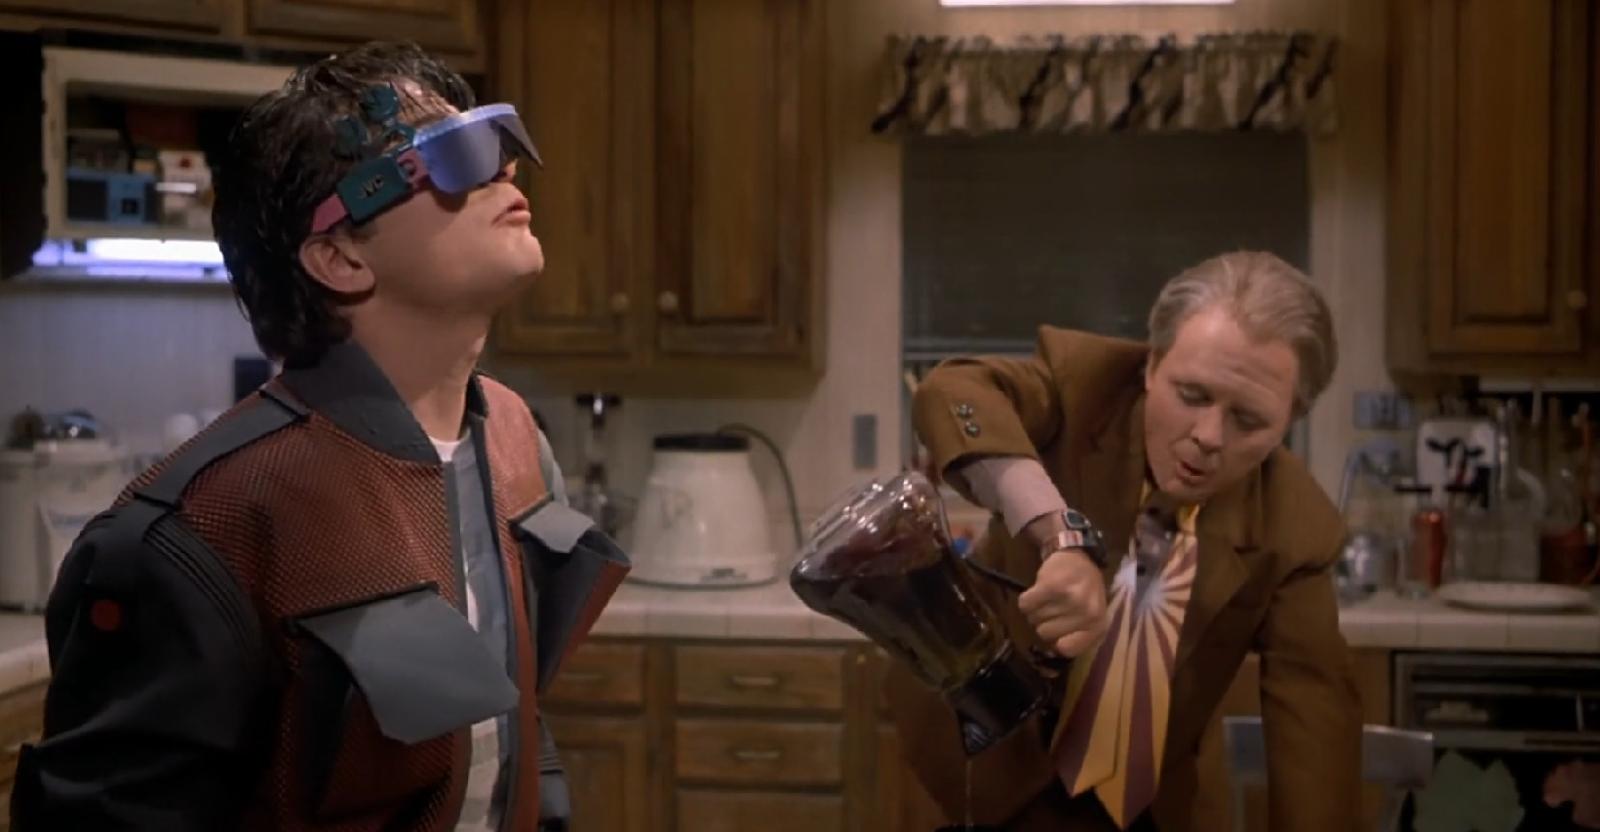 Smart Google pada film Back to the Future Part II (1989) - 4 Teknologi Film Fiksi Ilmiah Yang Menjadi Kenyataan